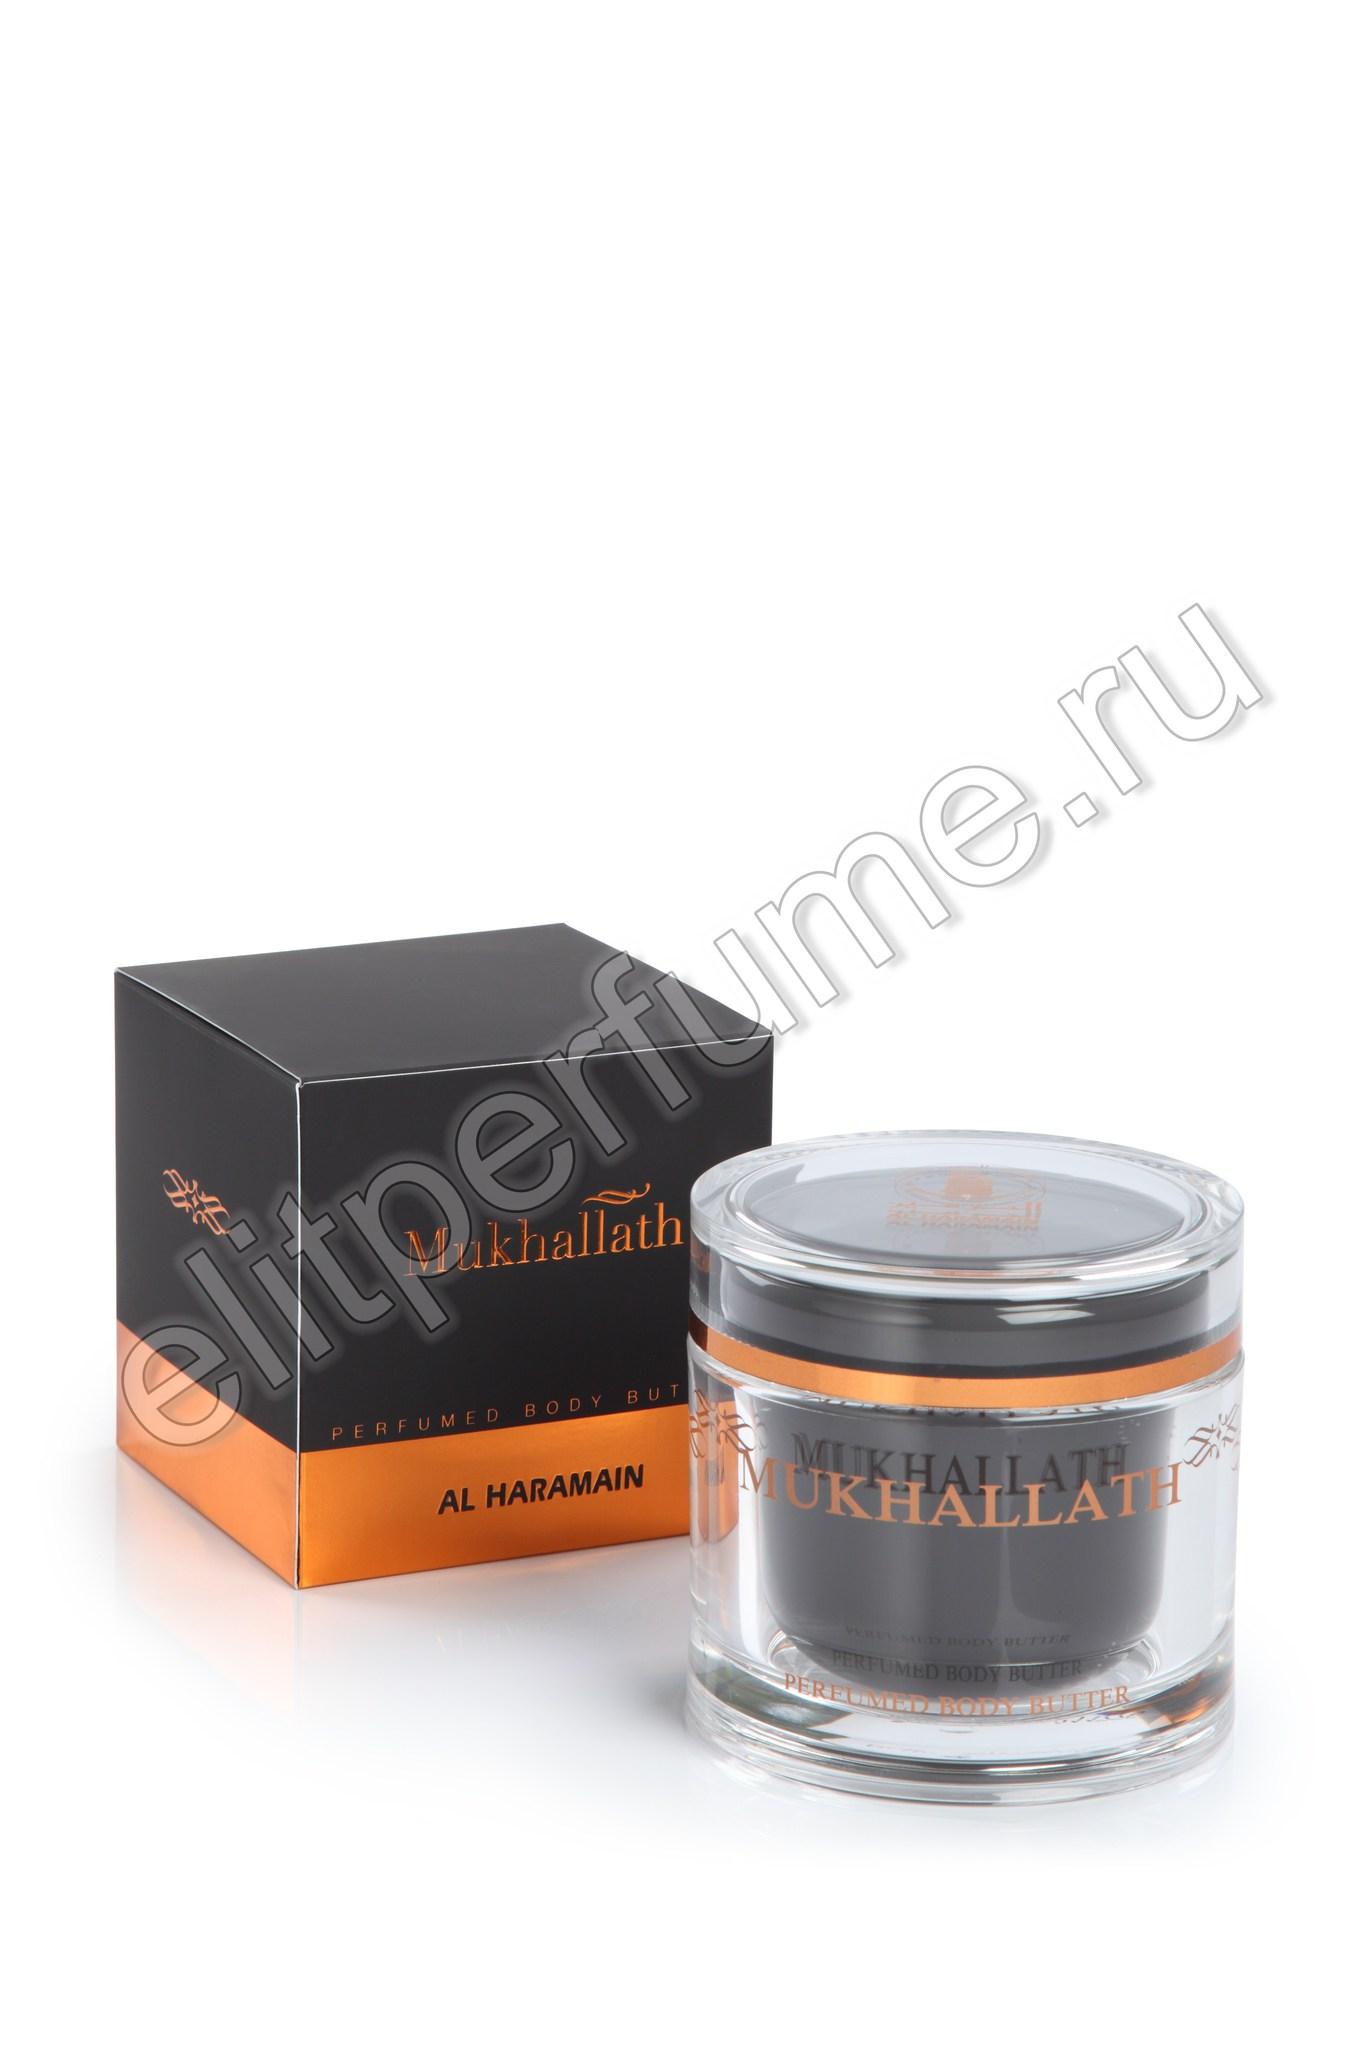 Арабское парфюмированное масло для тела Mukhallat МУхаллат 200 гр от Аль Харамайн Al Haramain Perfumes